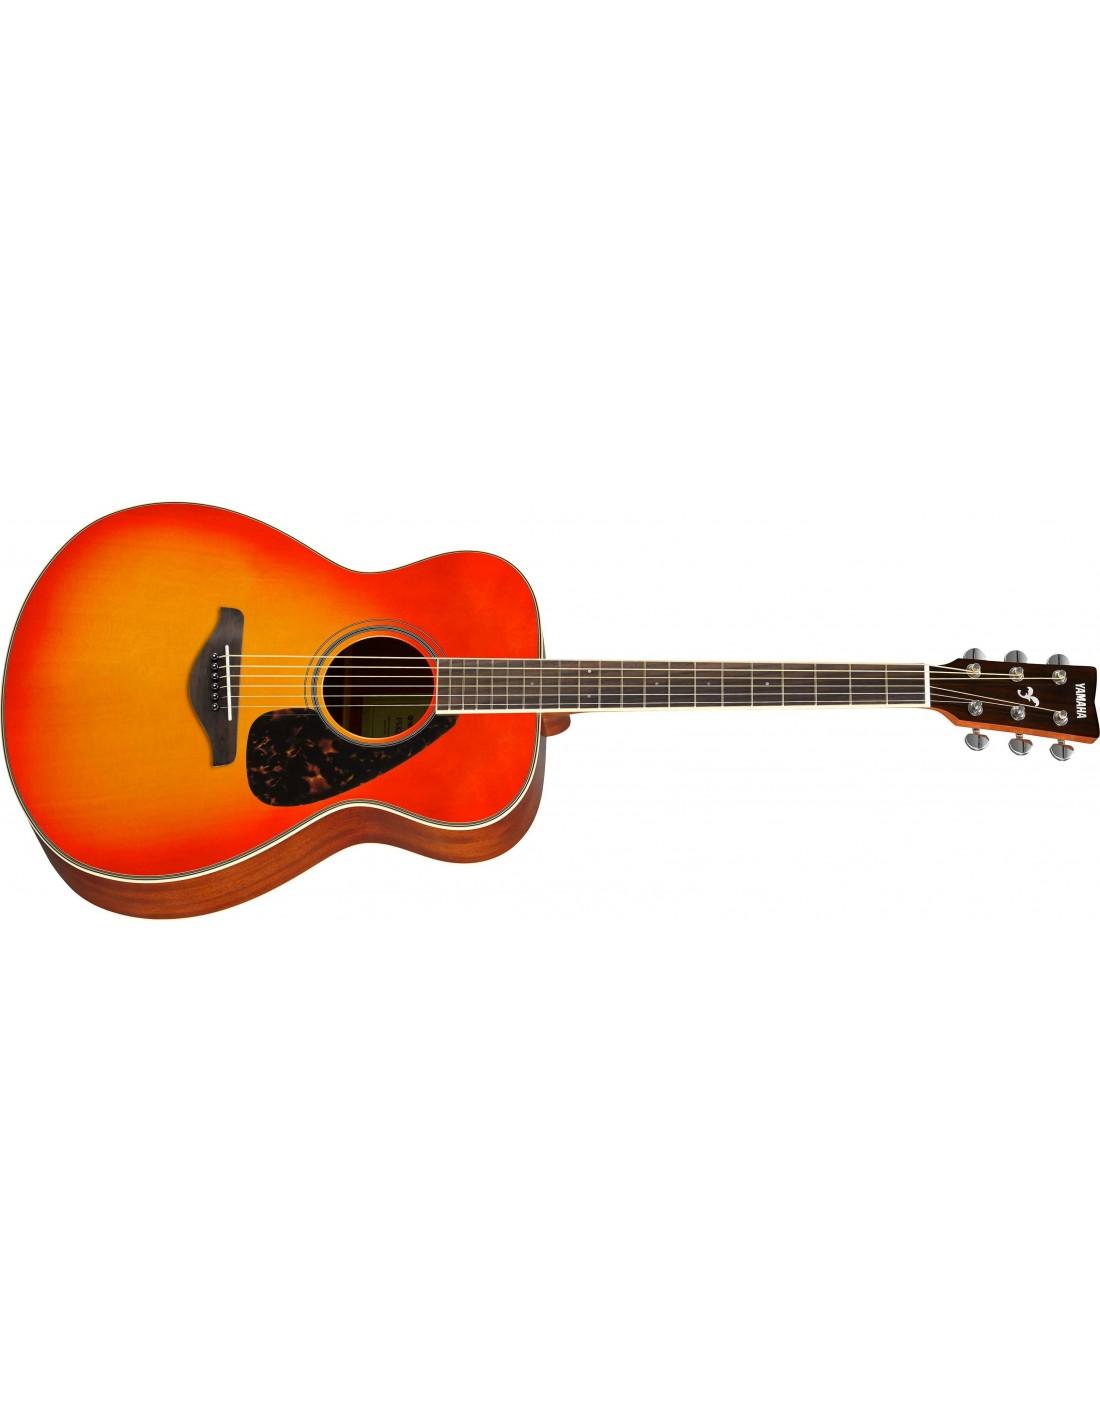 yamaha fs820 folk shape acoustic guitar autumn burst. Black Bedroom Furniture Sets. Home Design Ideas